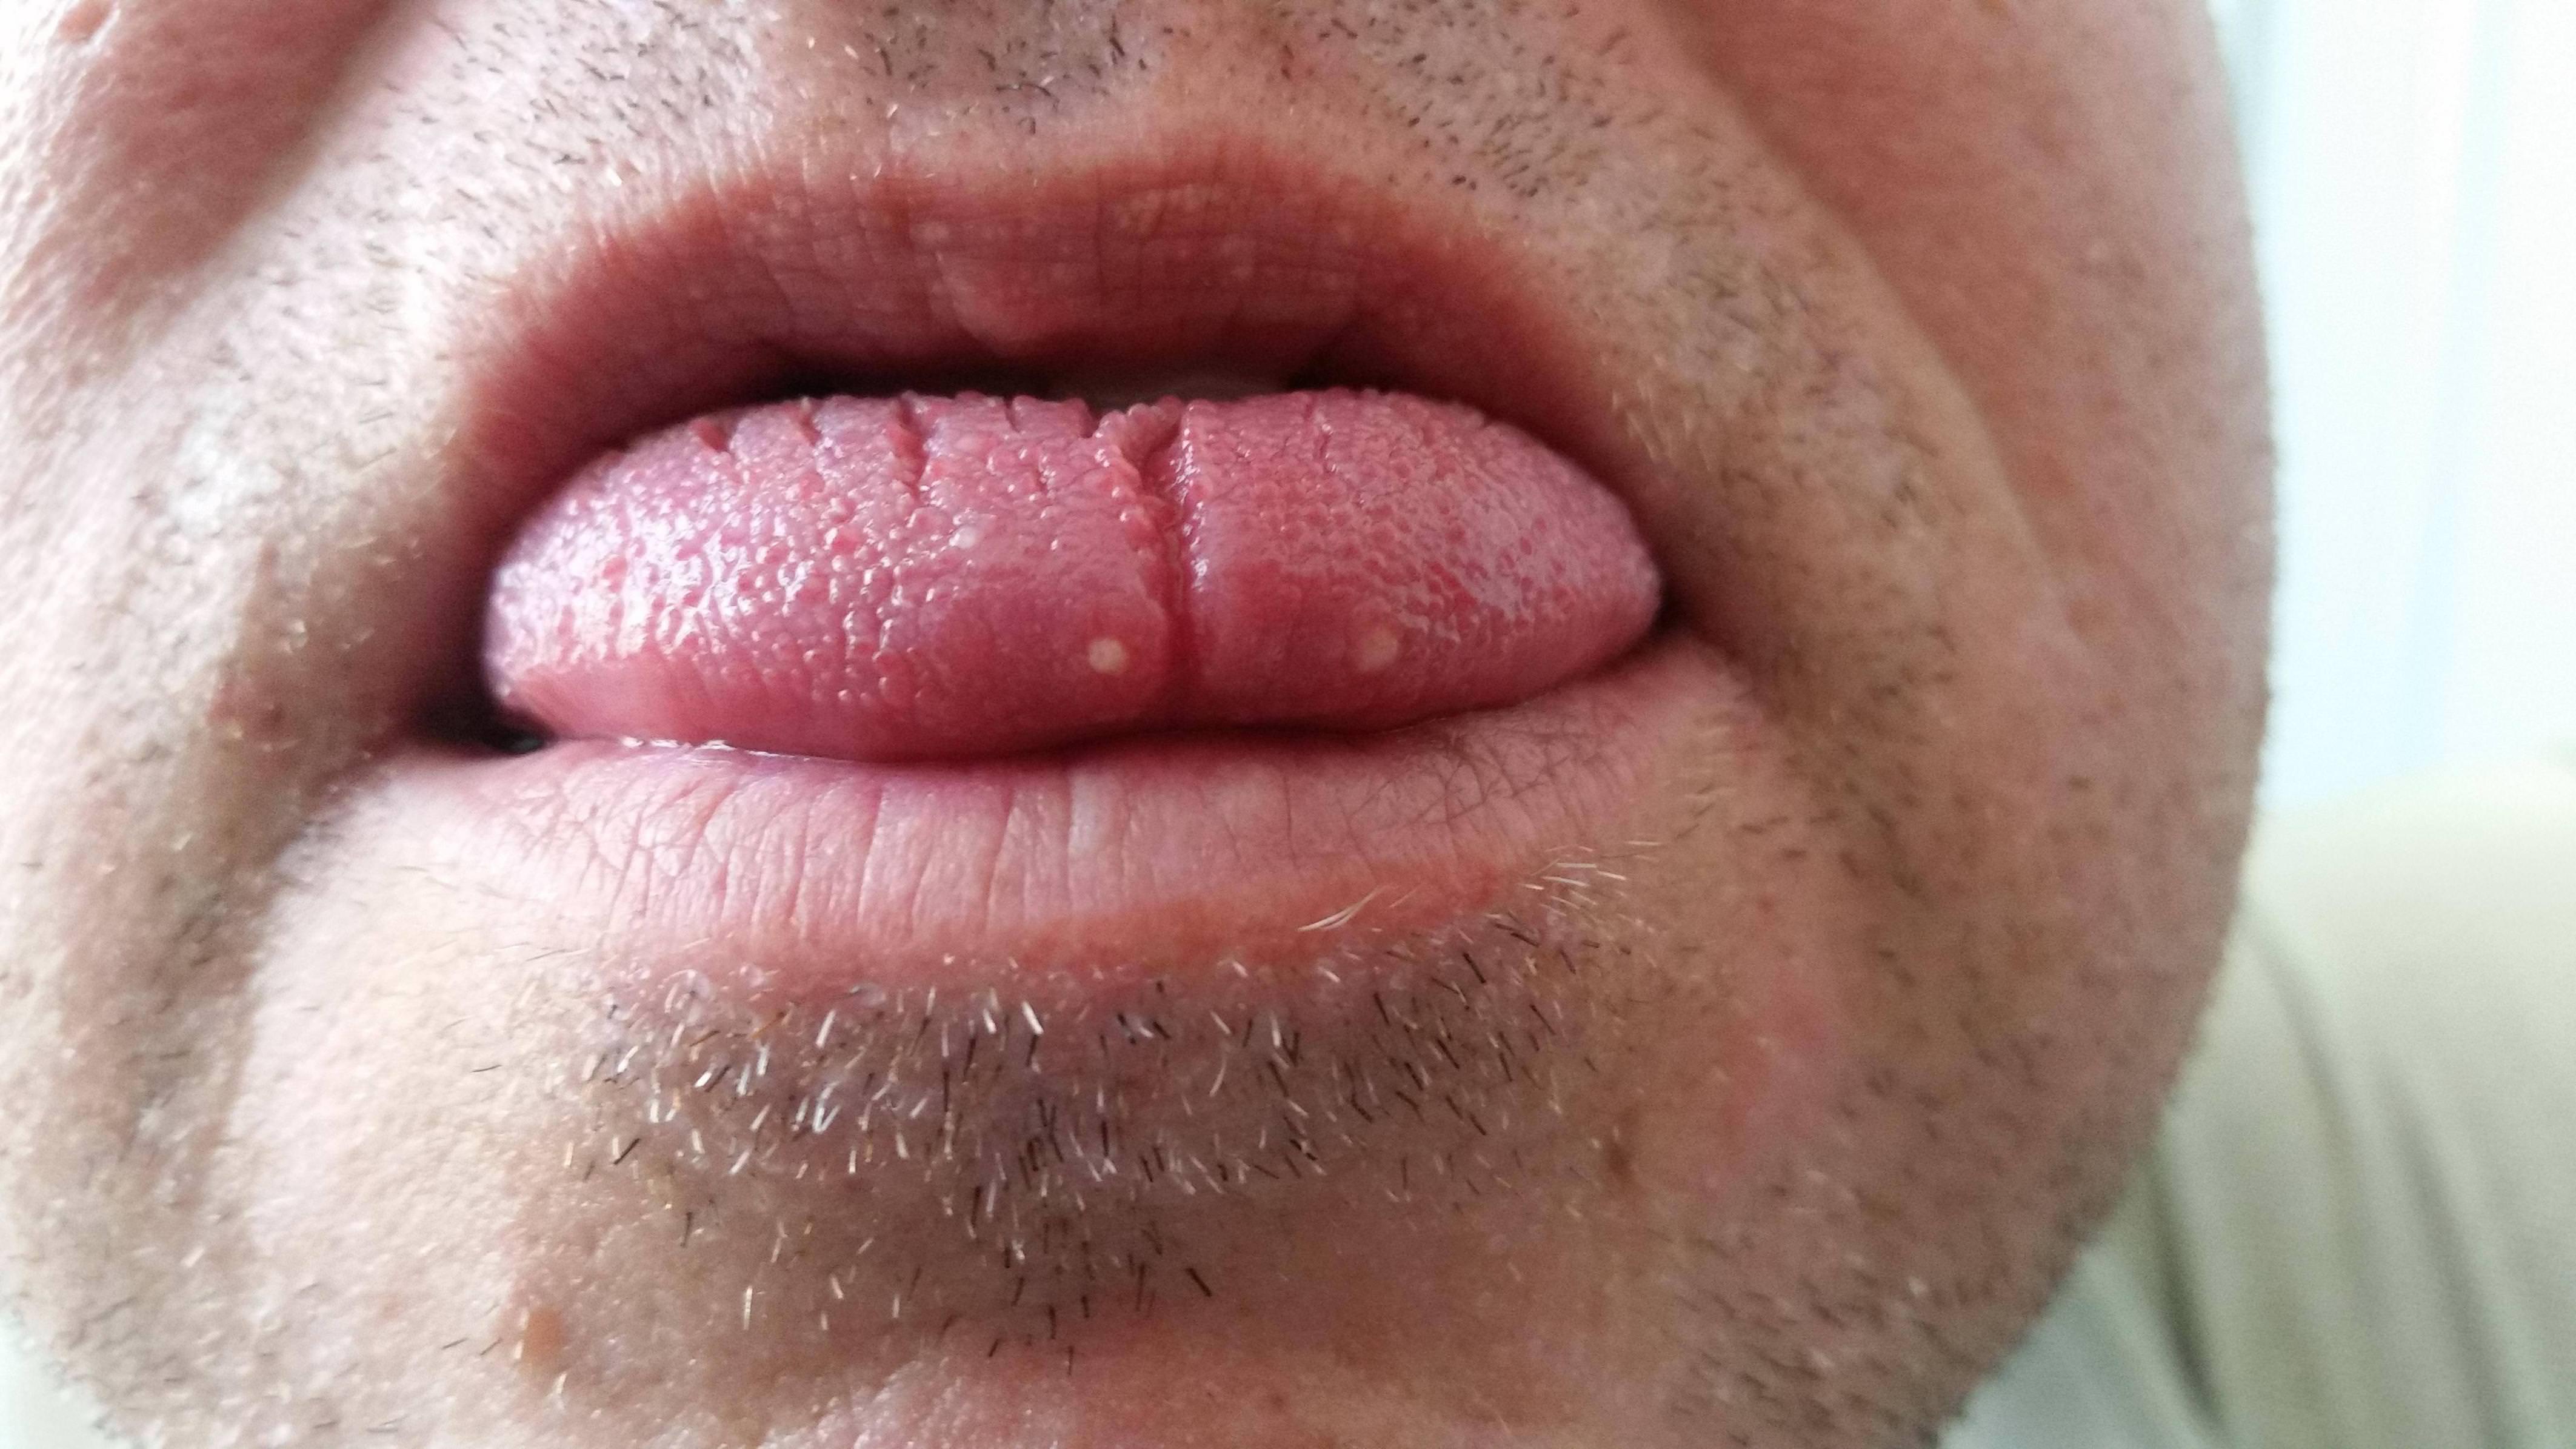 negi pe limba prezervativ și condilom